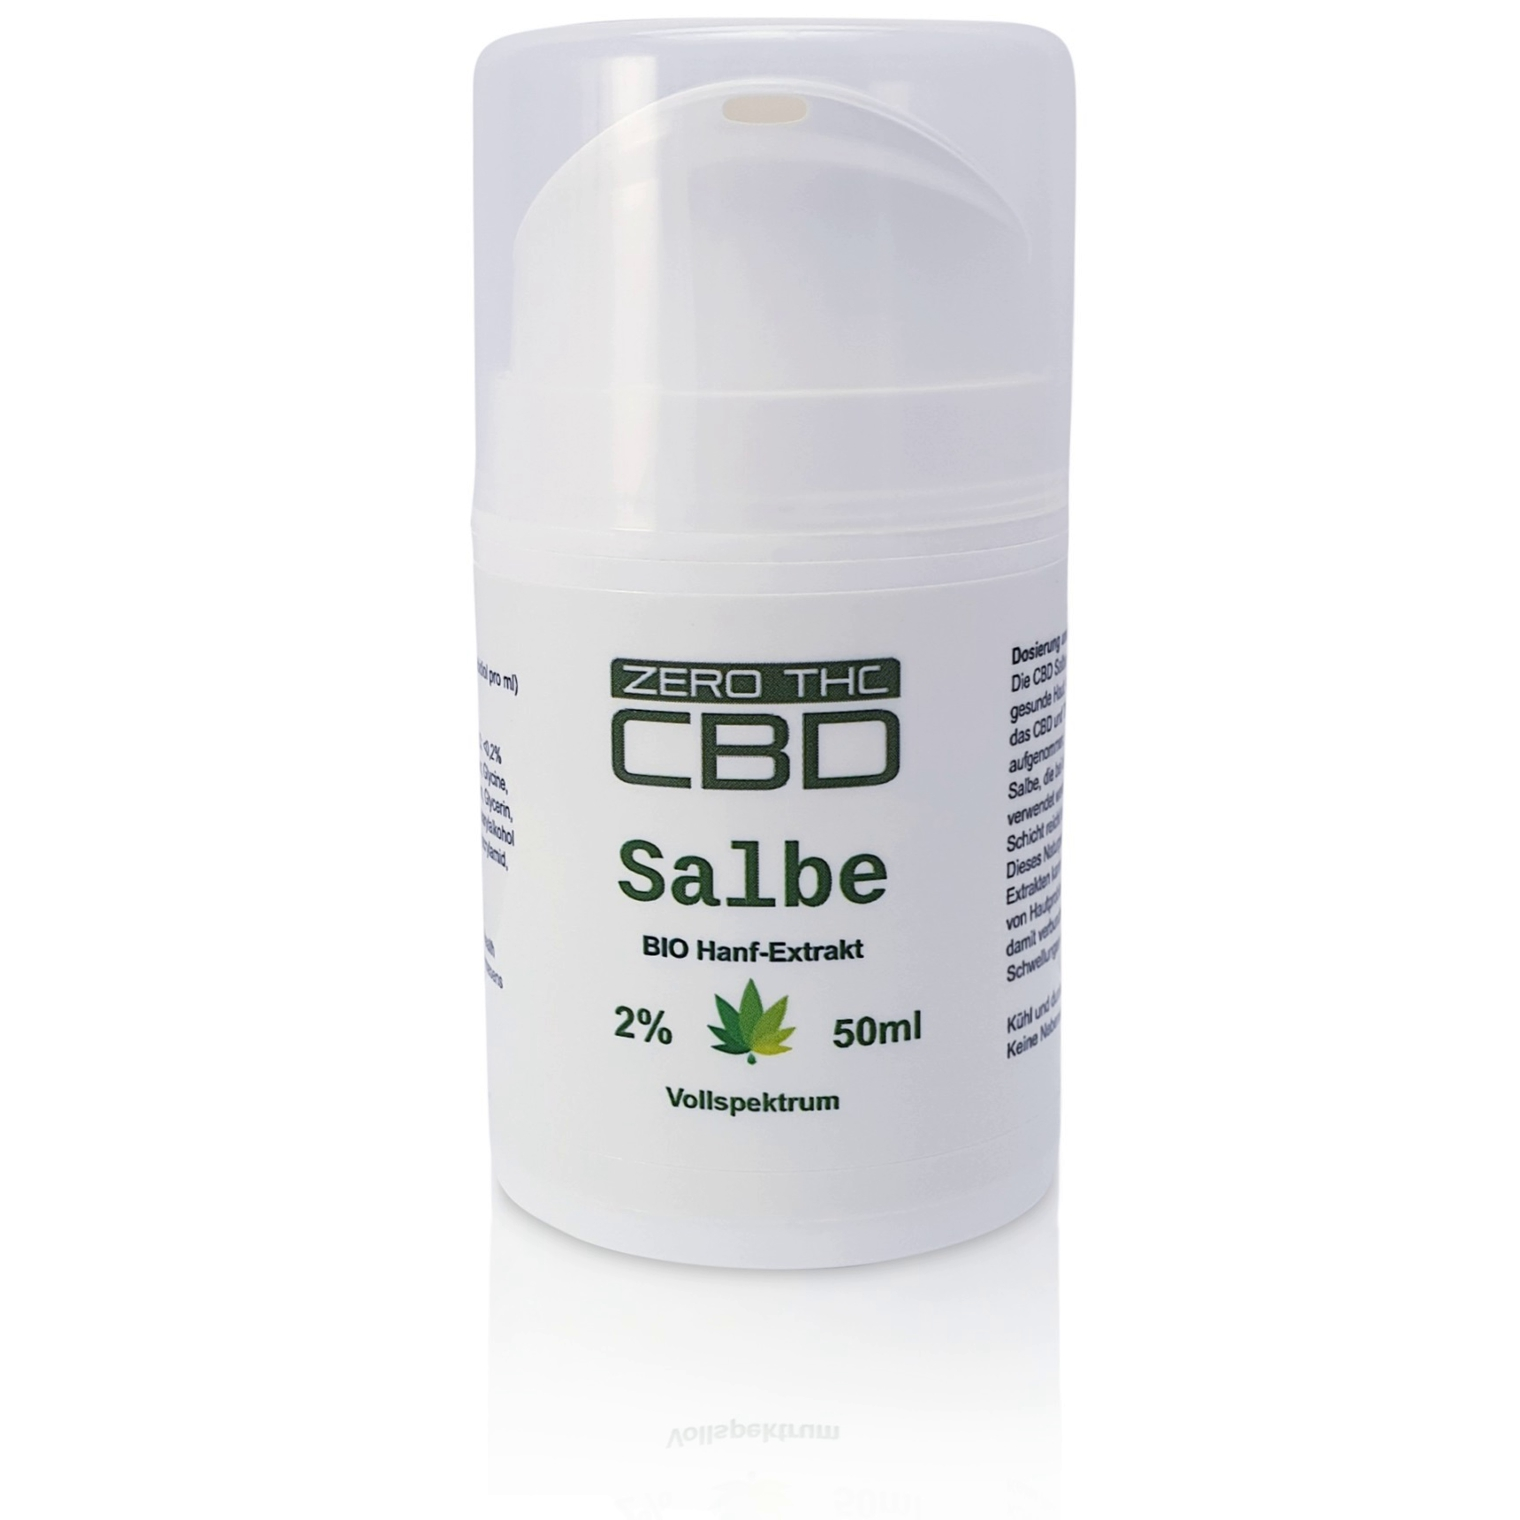 Pure CBD 2% ointment 50ml balm soft